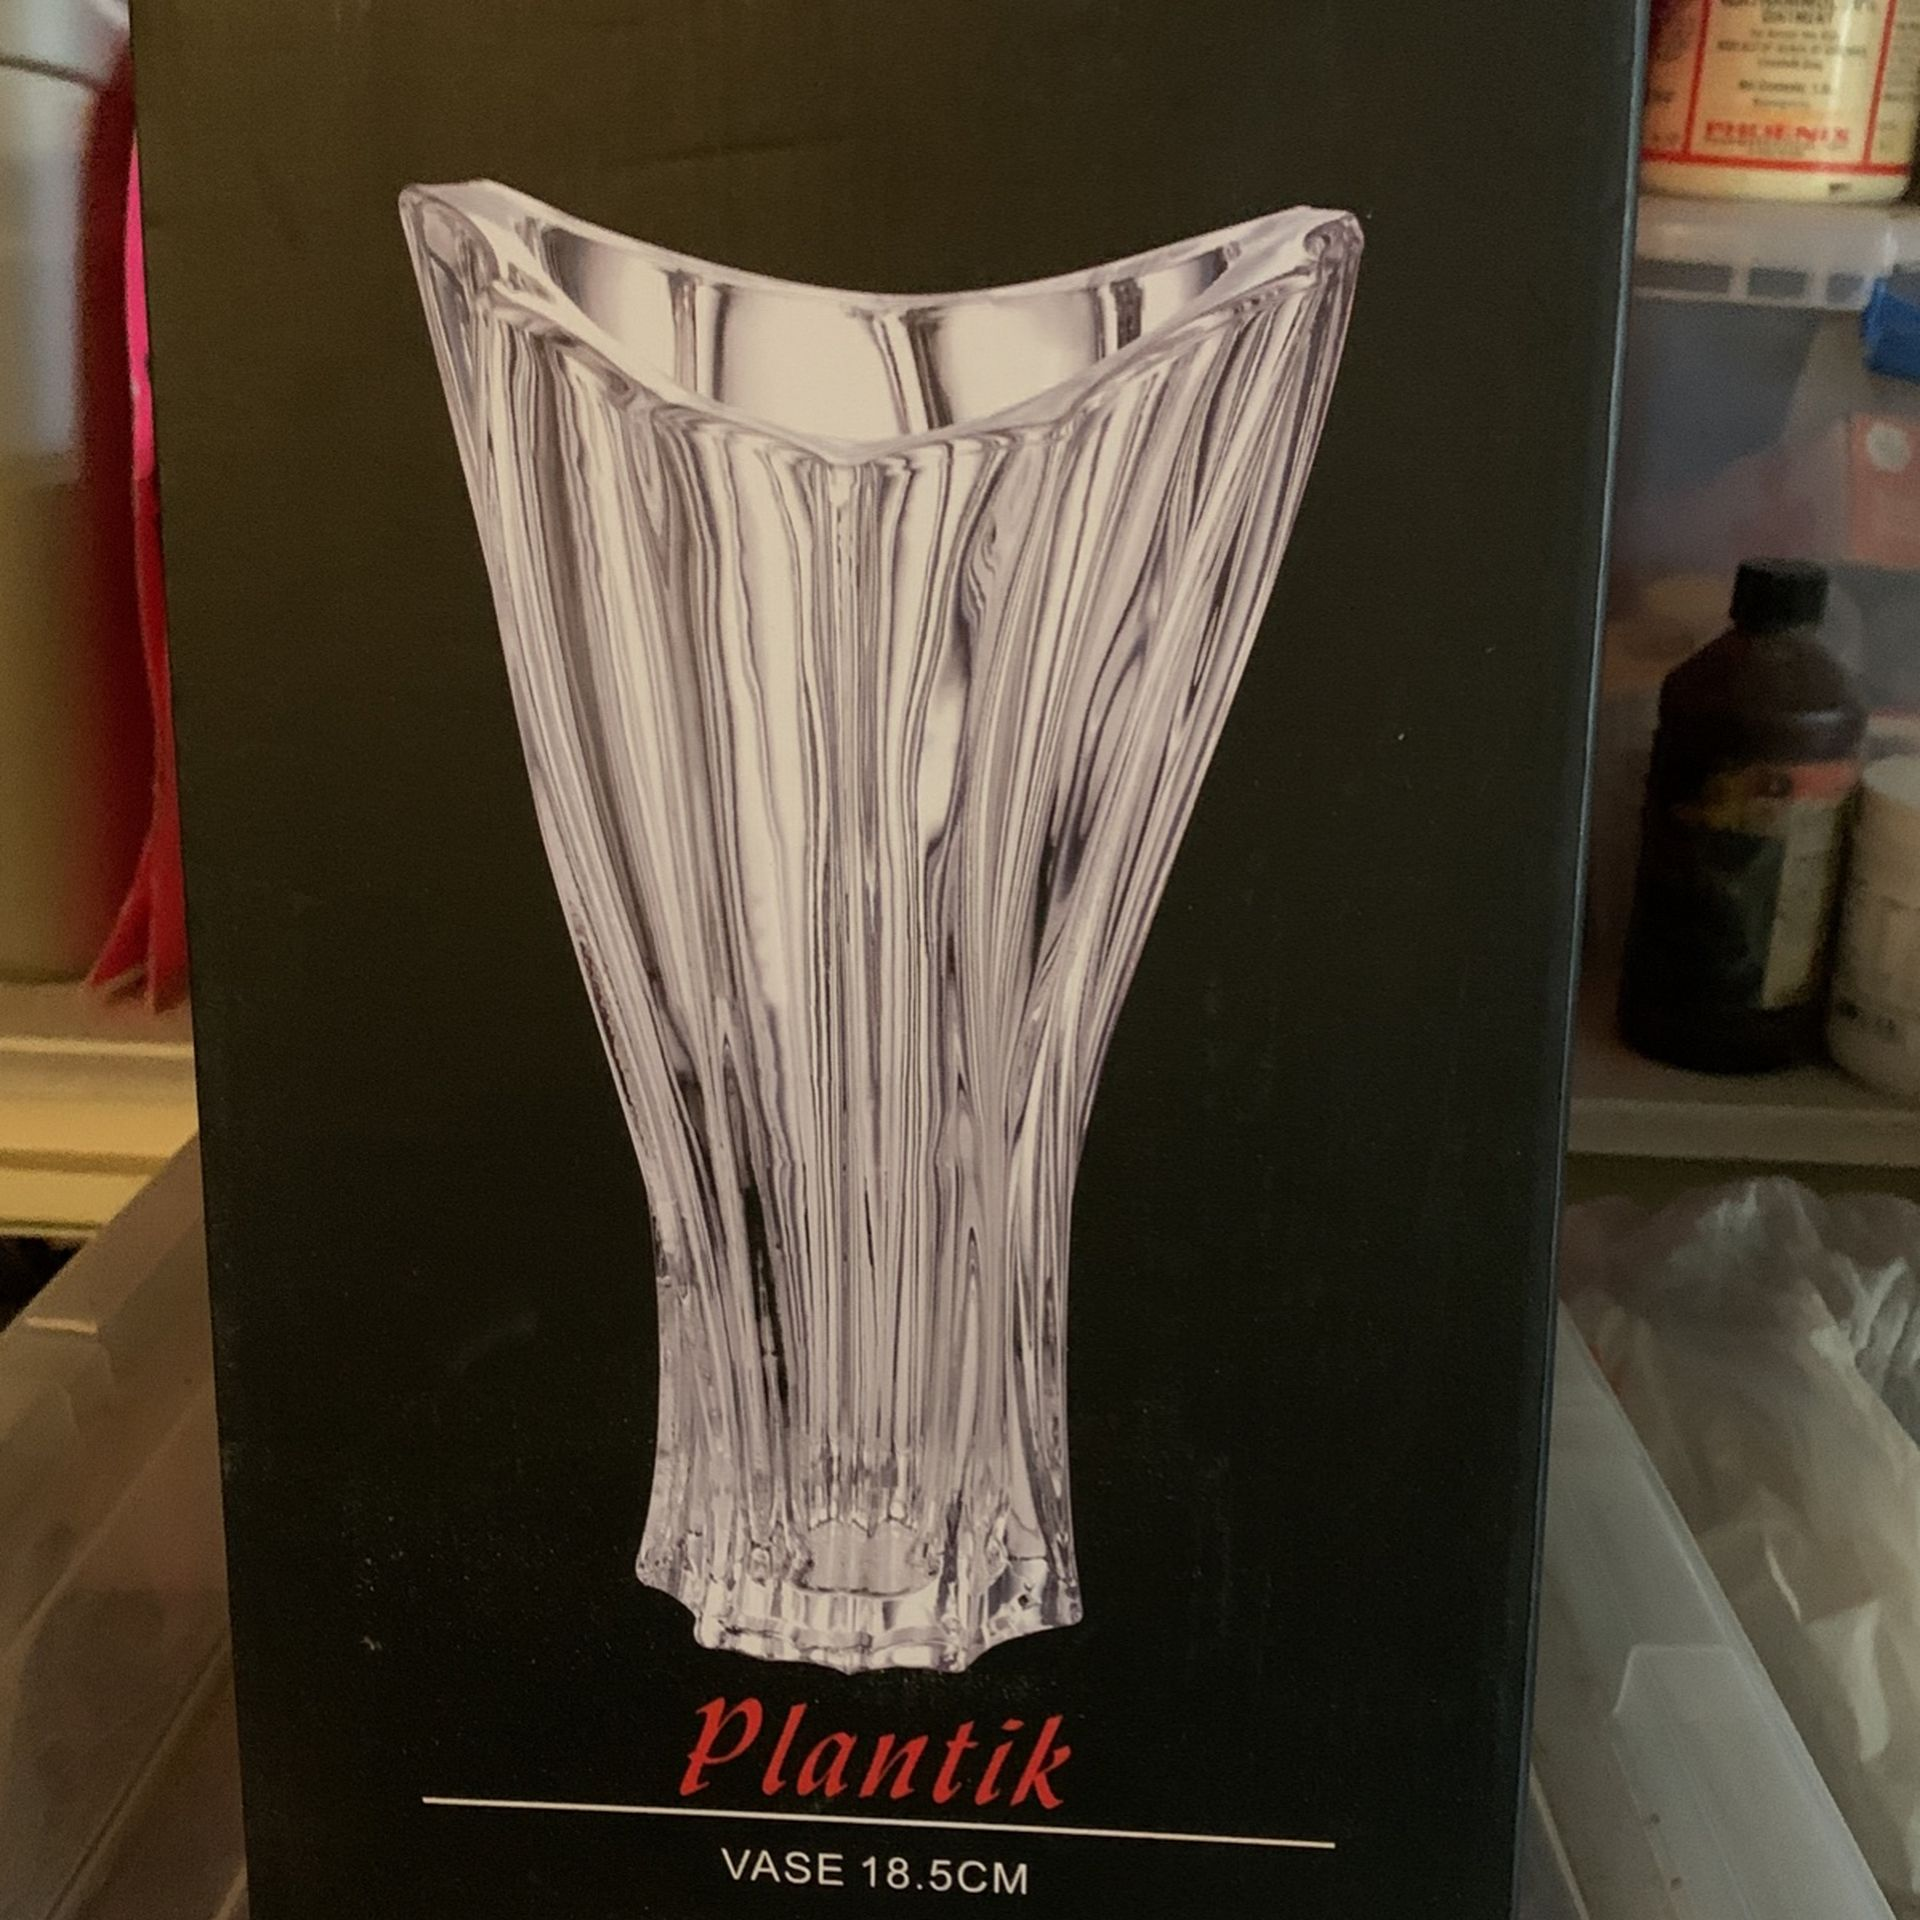 Glass vase 18.5cm